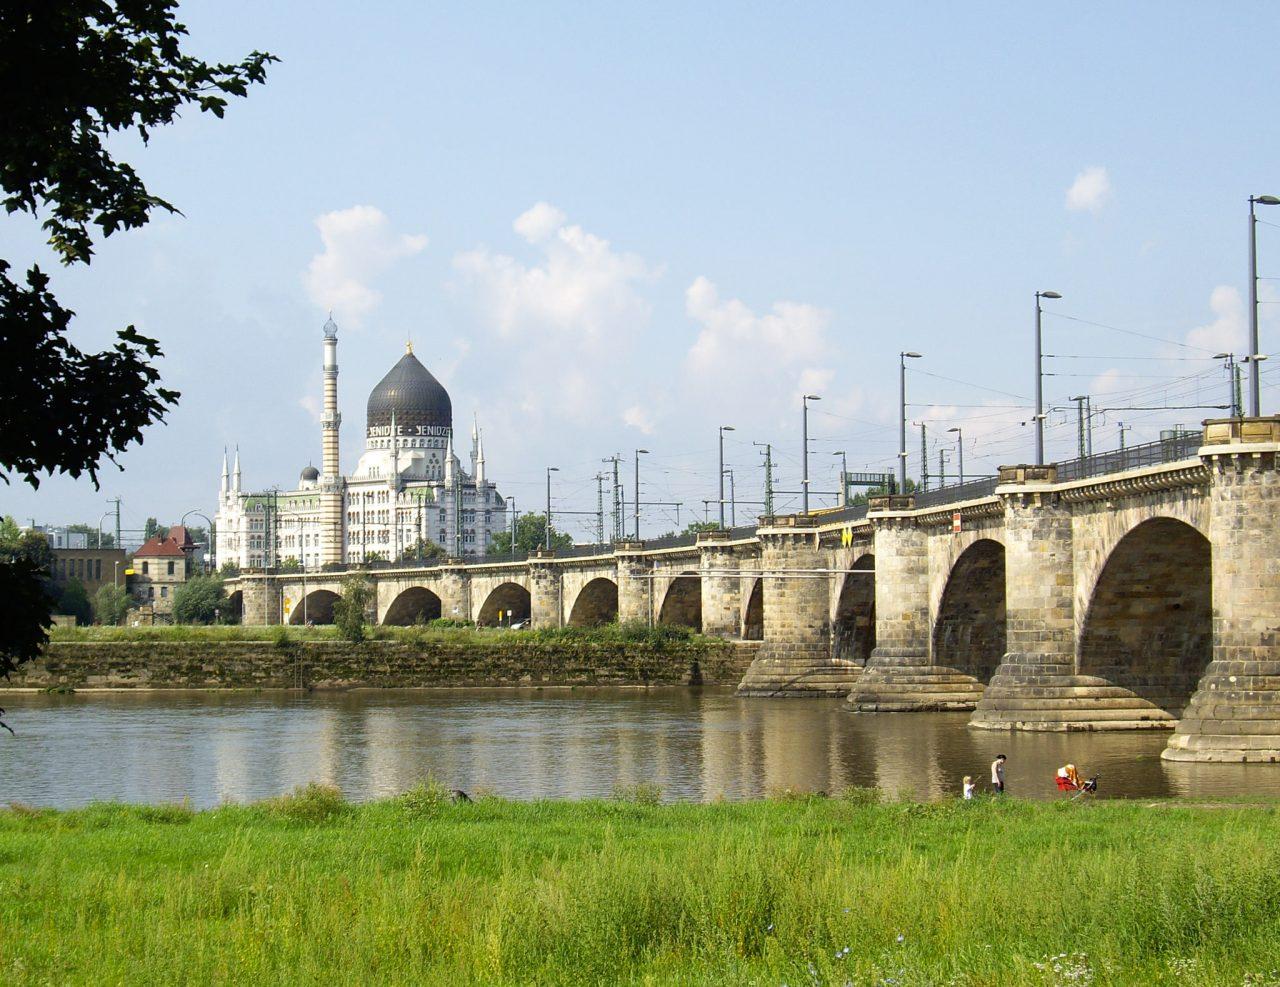 Фабрика на фоне моста Marienbrücke